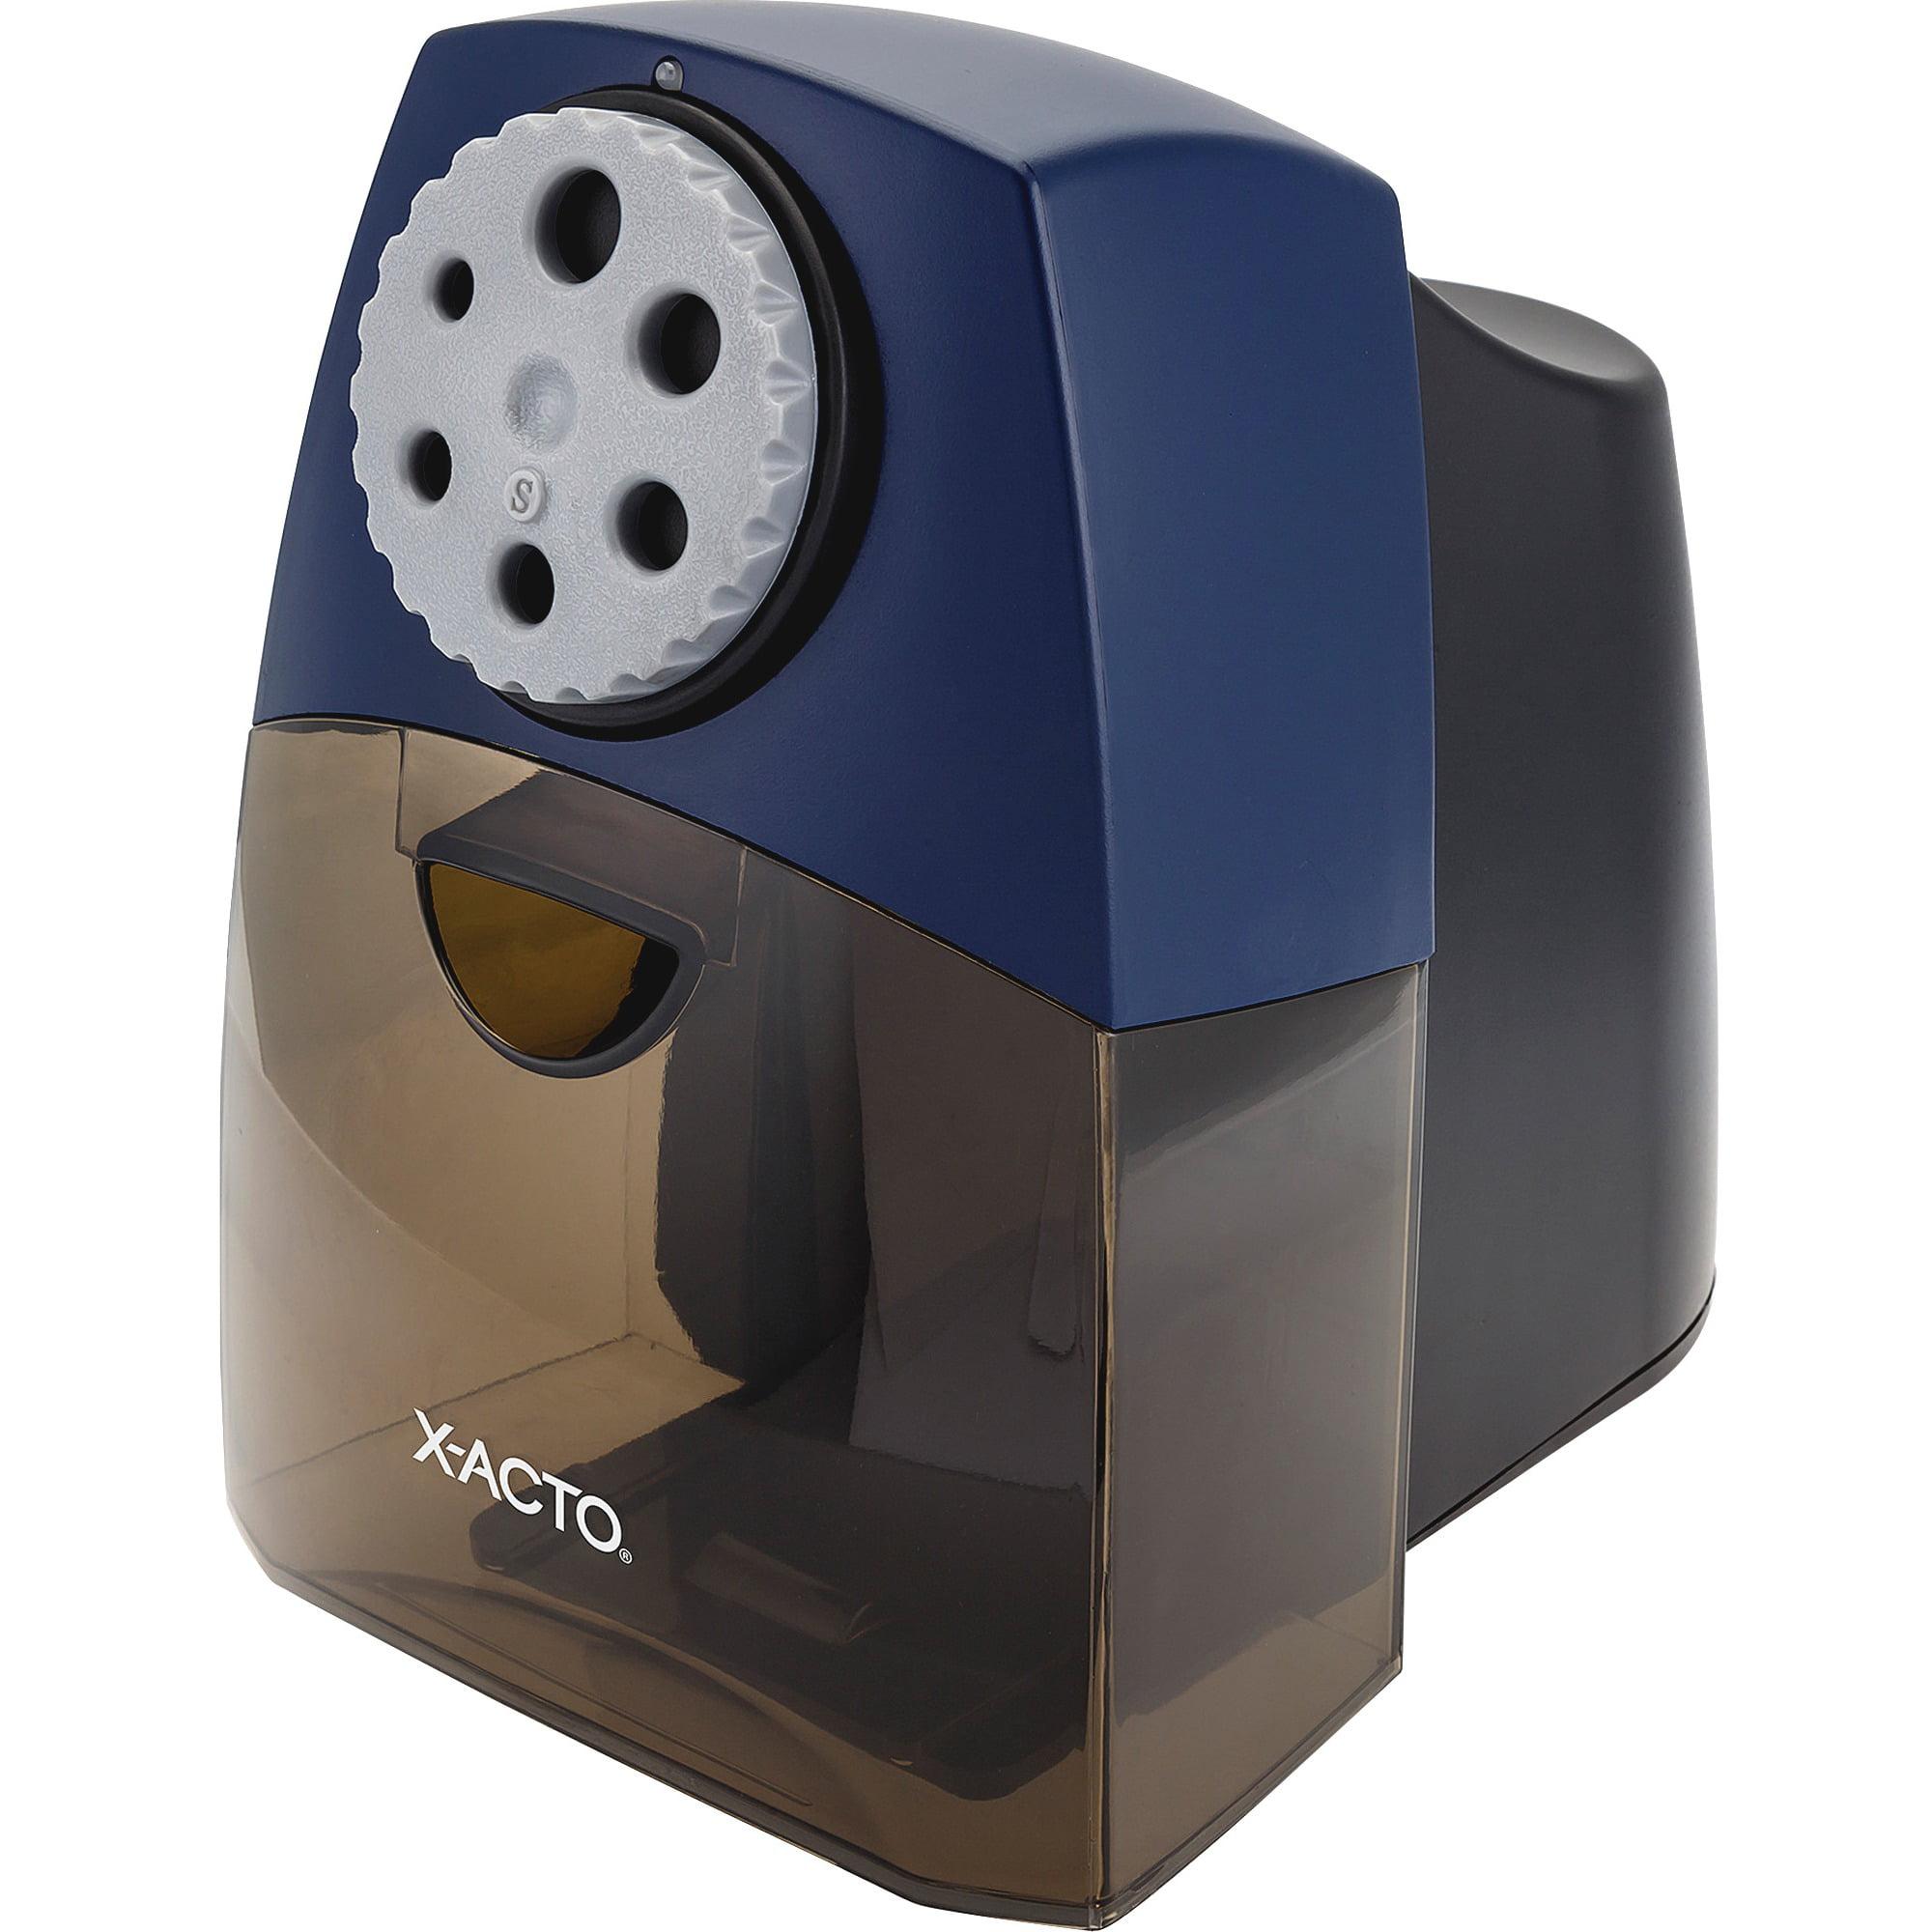 X-Acto Teacher Pro Electric Sharpener